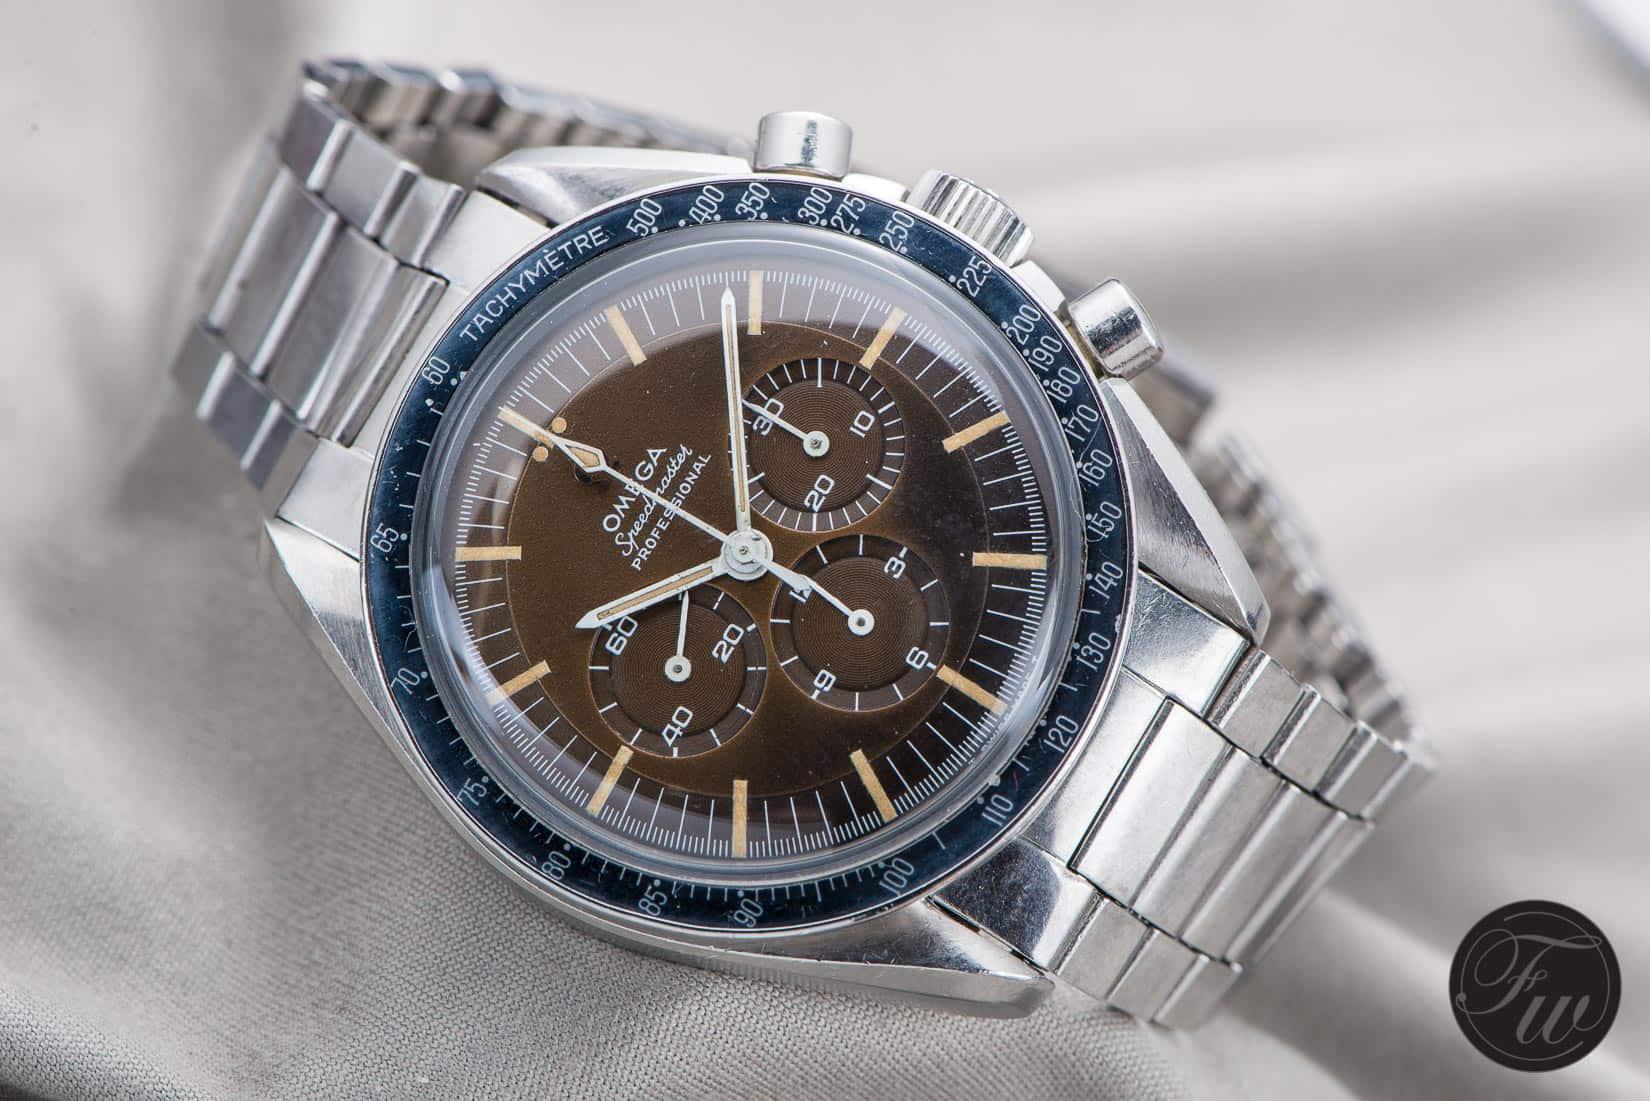 Speedmaster 145.012 Moonwatch